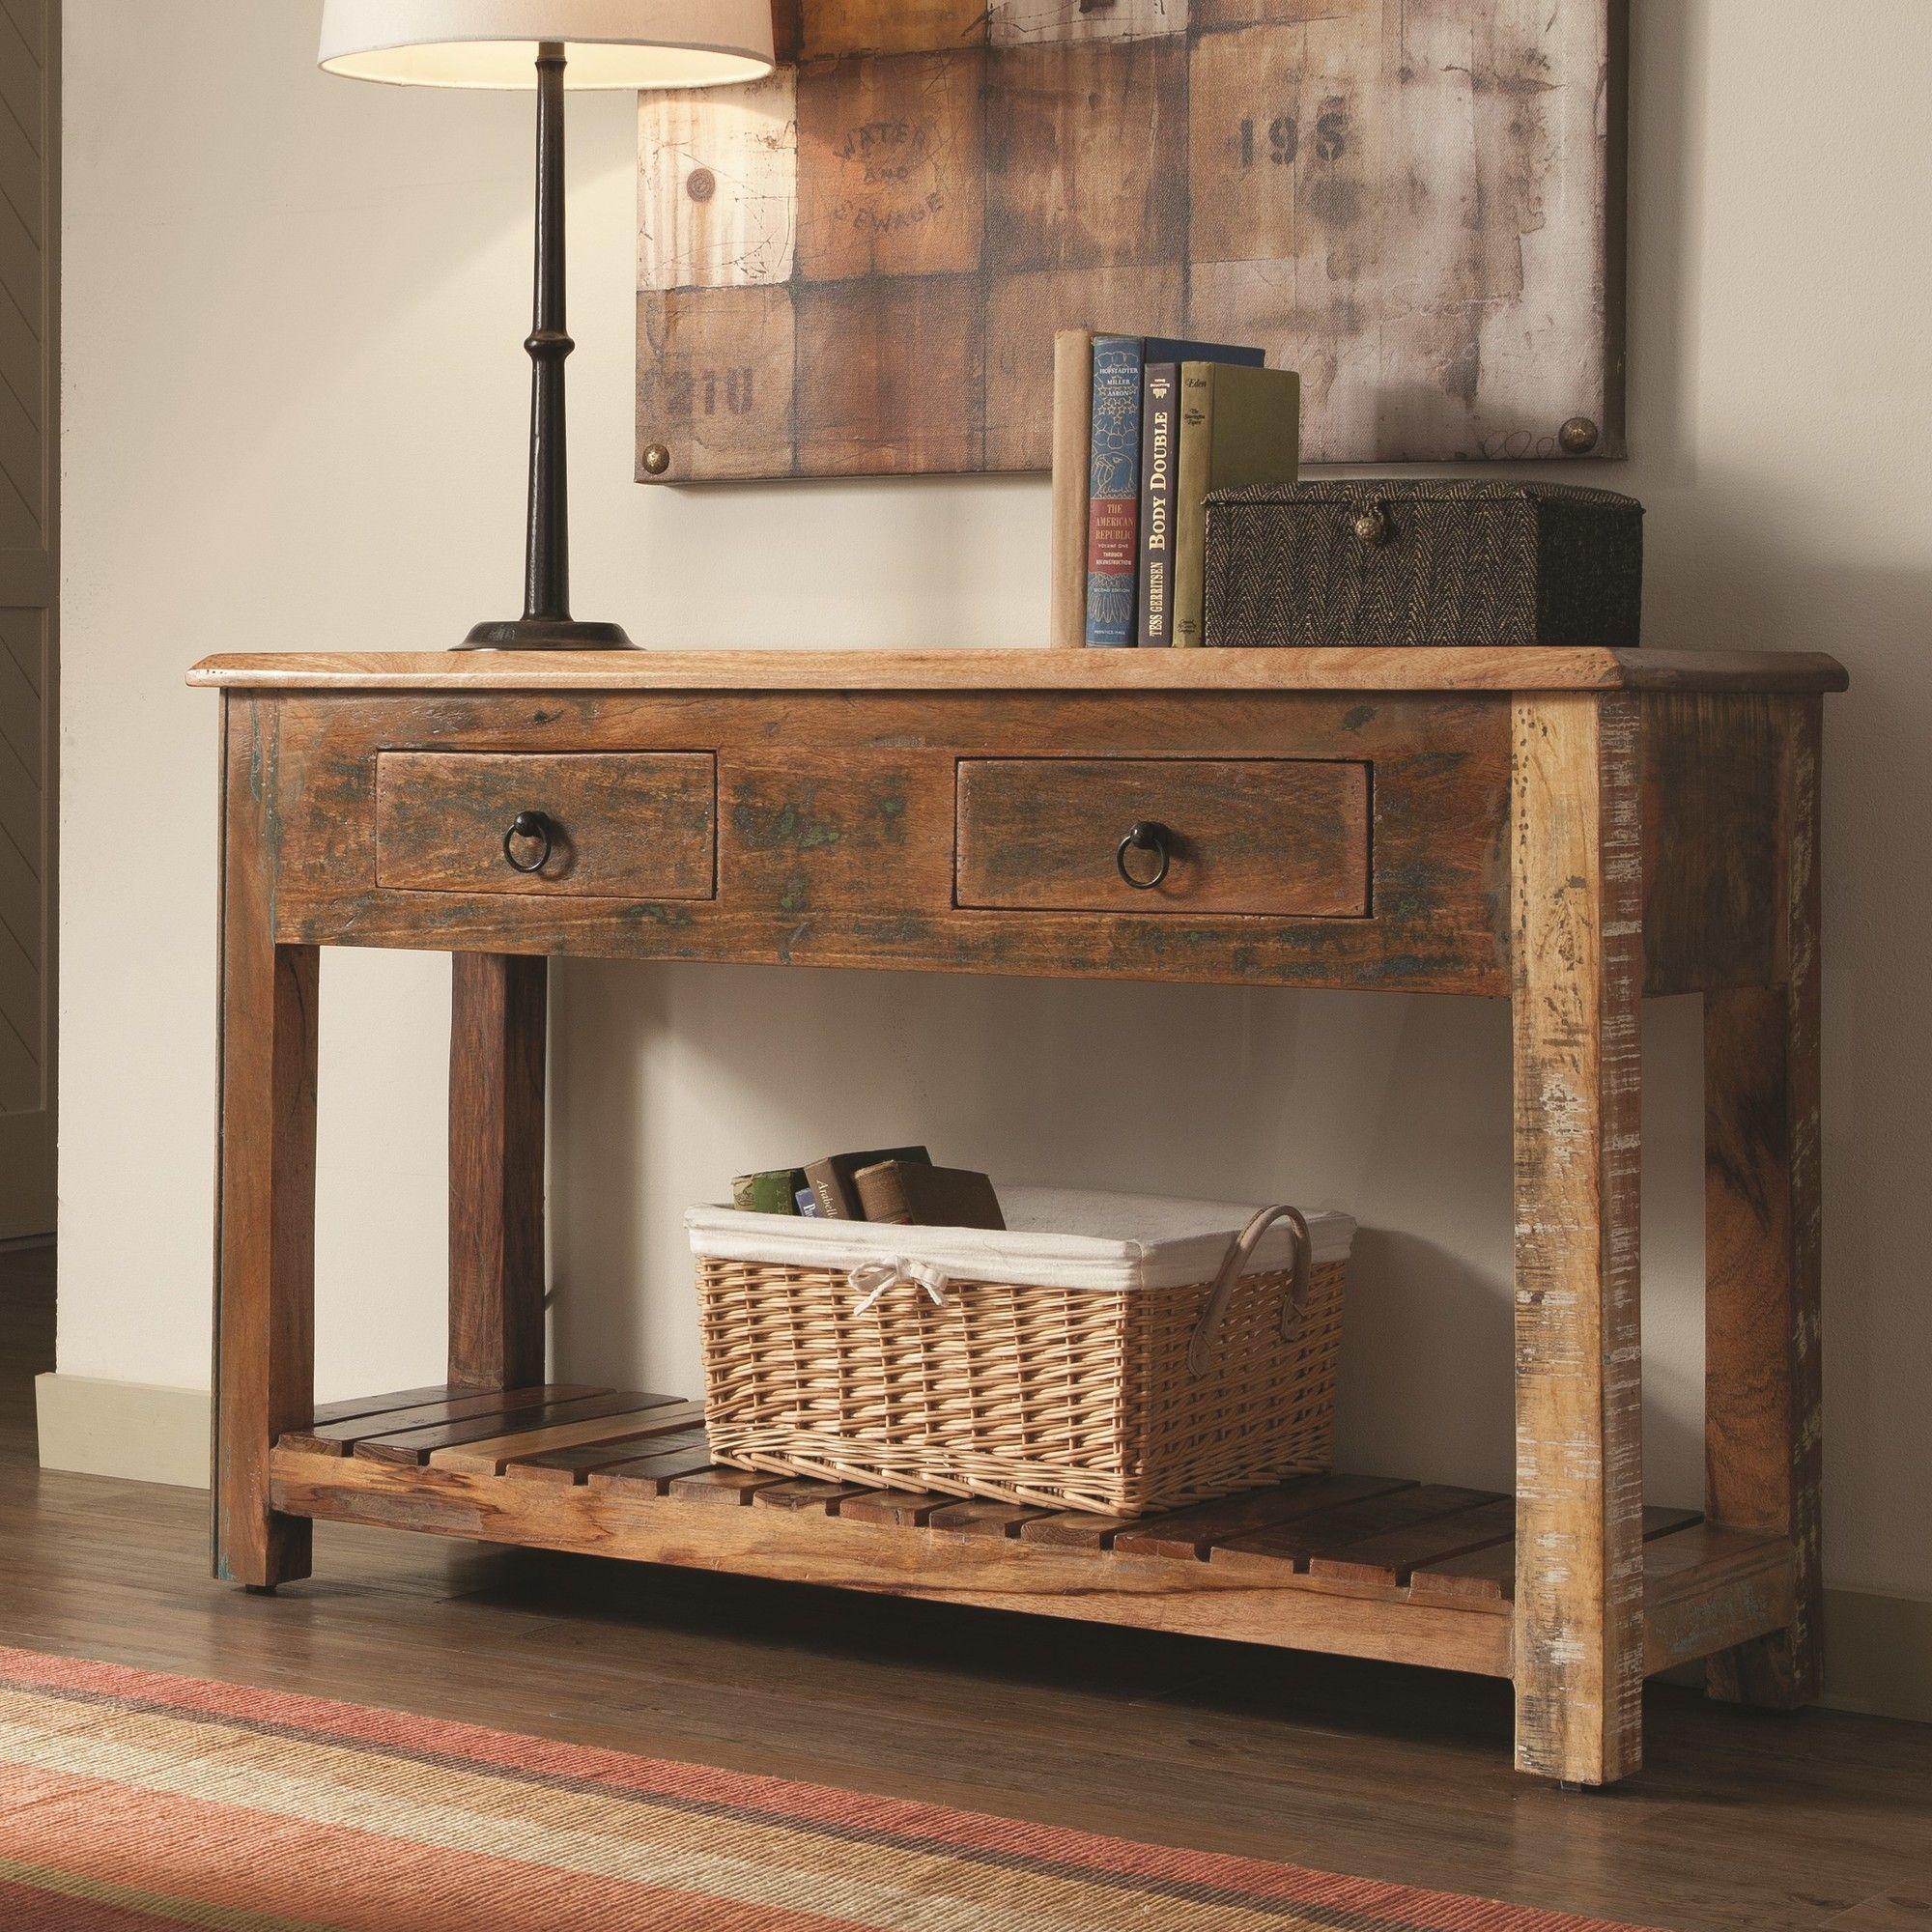 Katrina Reclaimed Wood Console Table Rustic Console Tables Rustic Sofa Tables Wooden Console Table